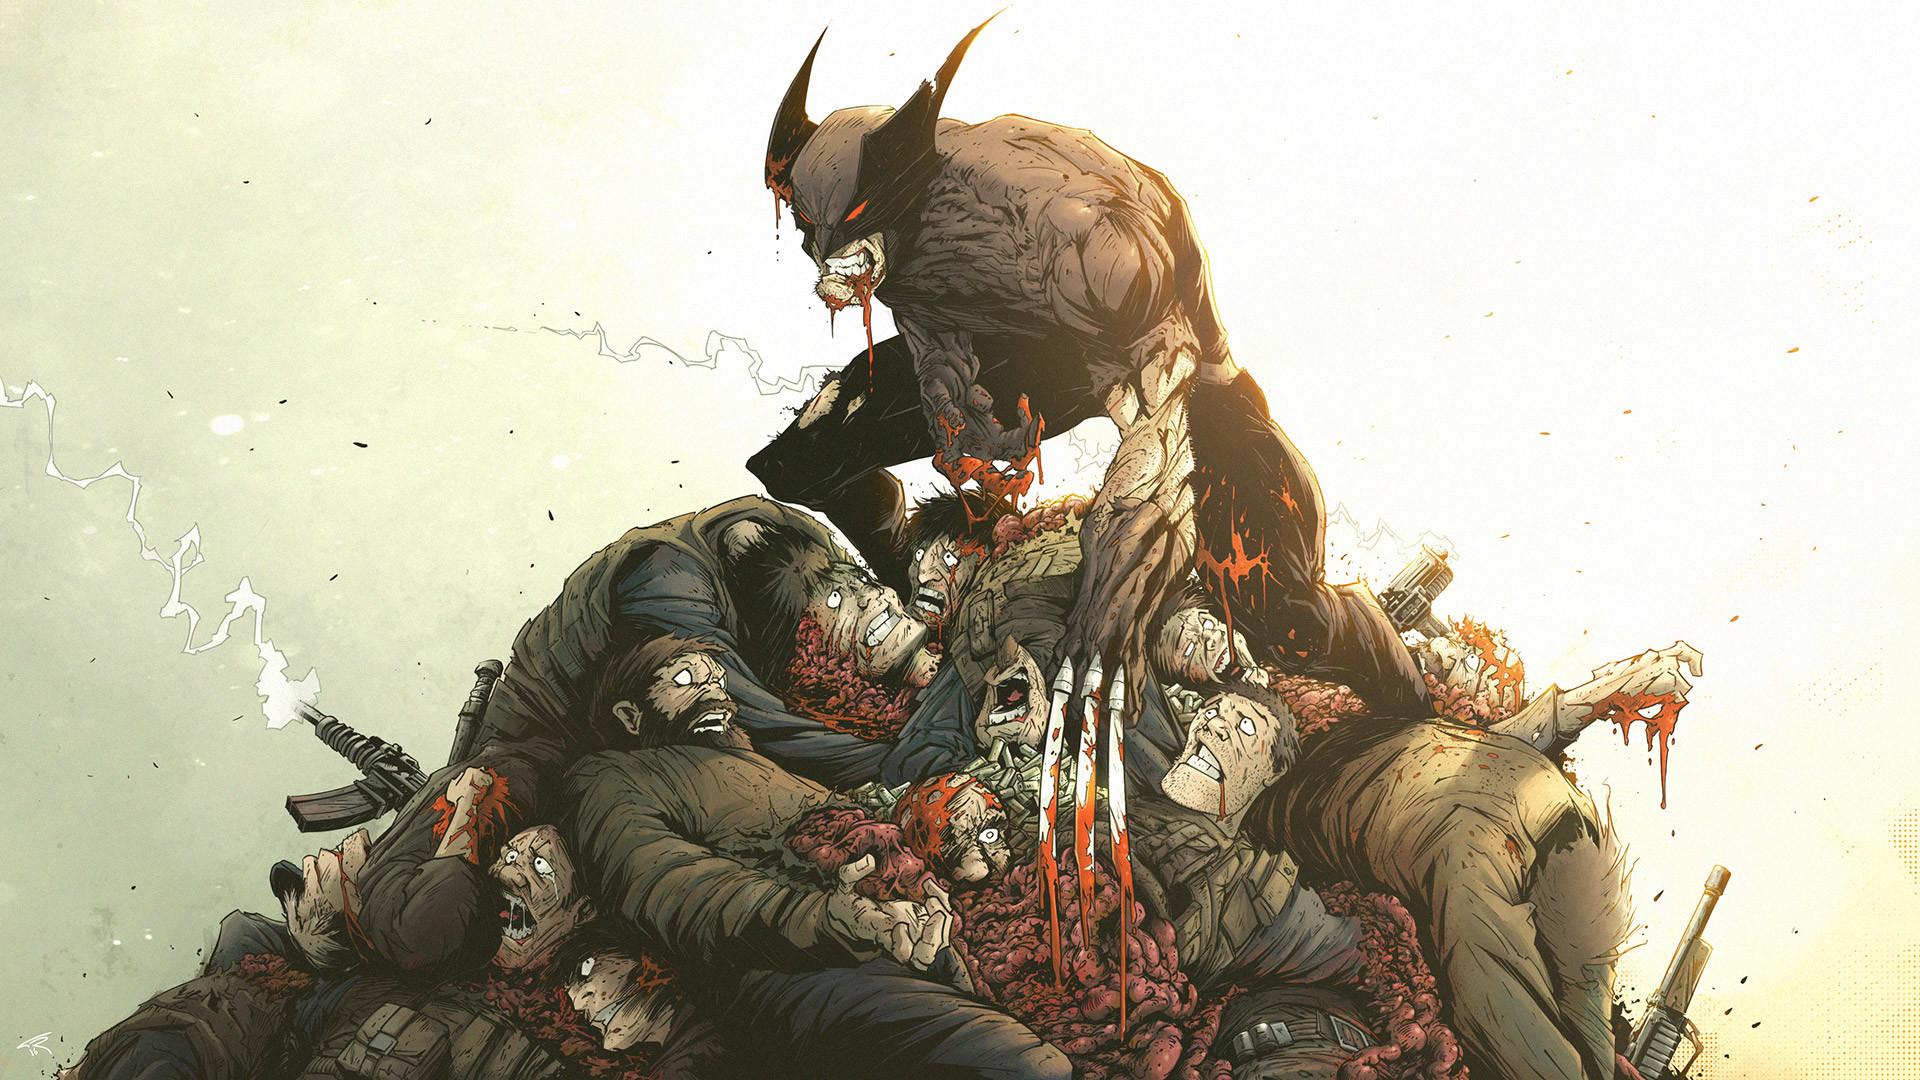 4790fe35c75 Wolverine : Bloodline by Romain Lefevre : ImaginaryCarnage